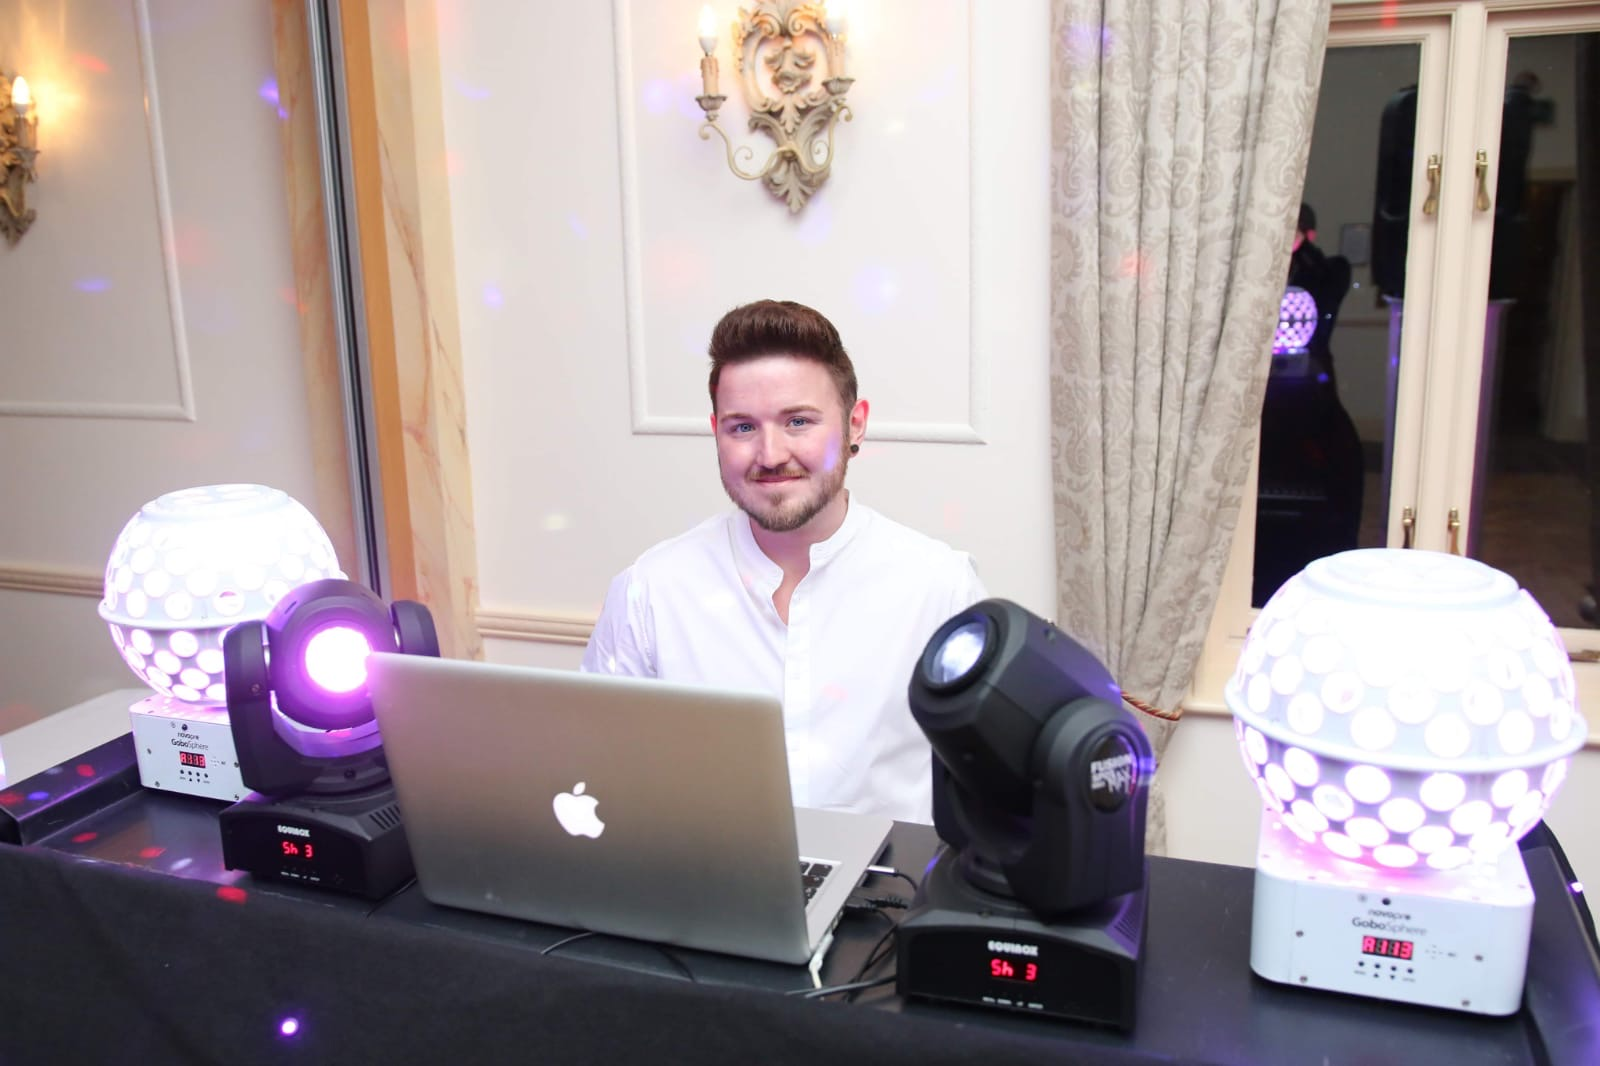 DJ Matthew is a wedding DJ from Kent